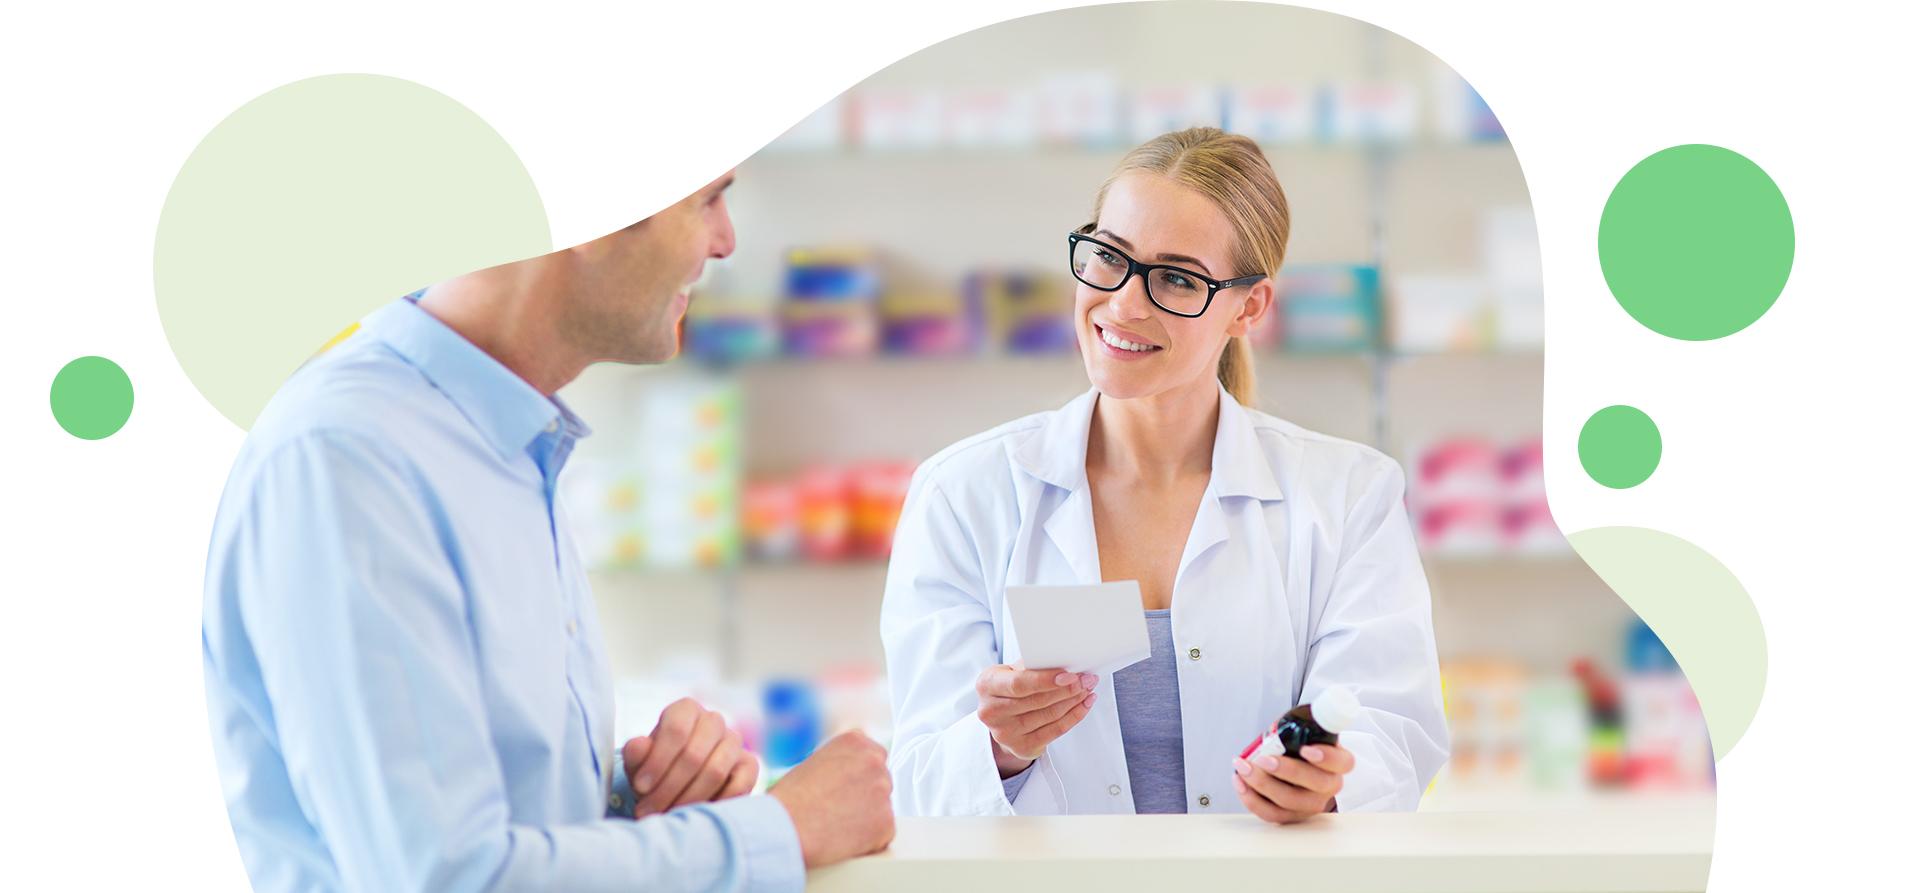 pharmarcie à paris 2